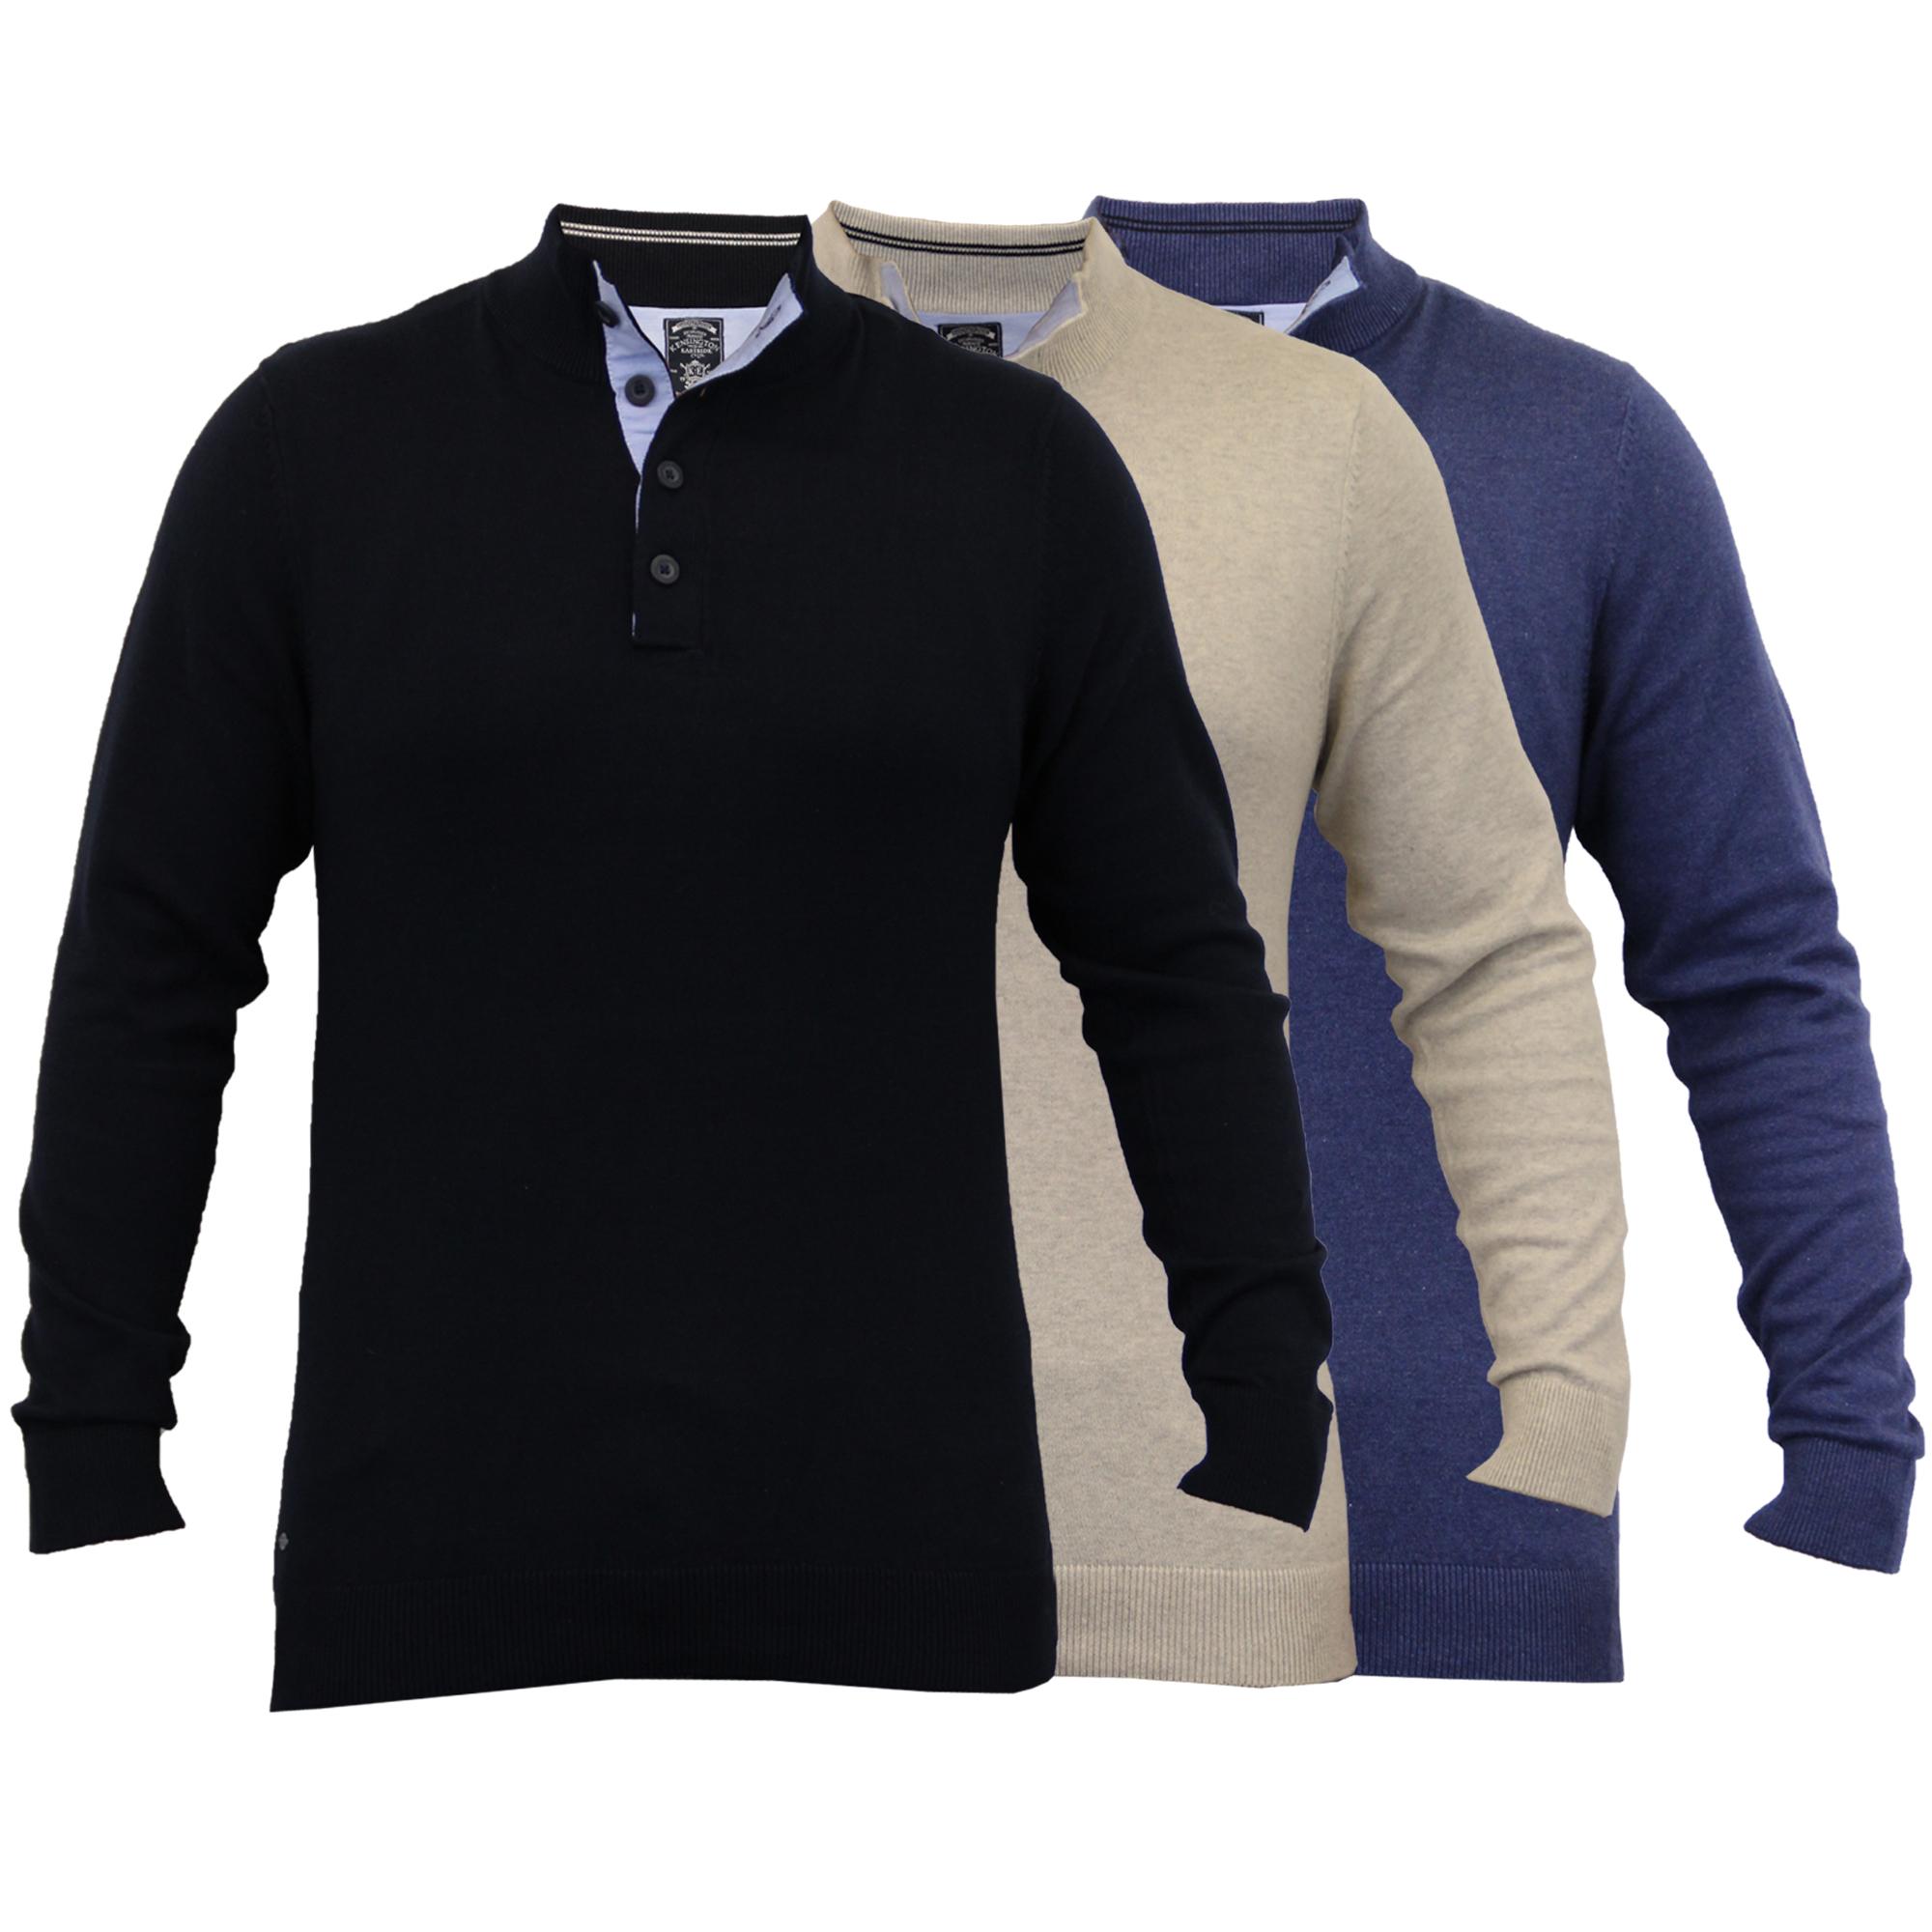 Mens Knitted Jumper Kensington Eastside Pullover Sweater Top Funnel Neck Winter